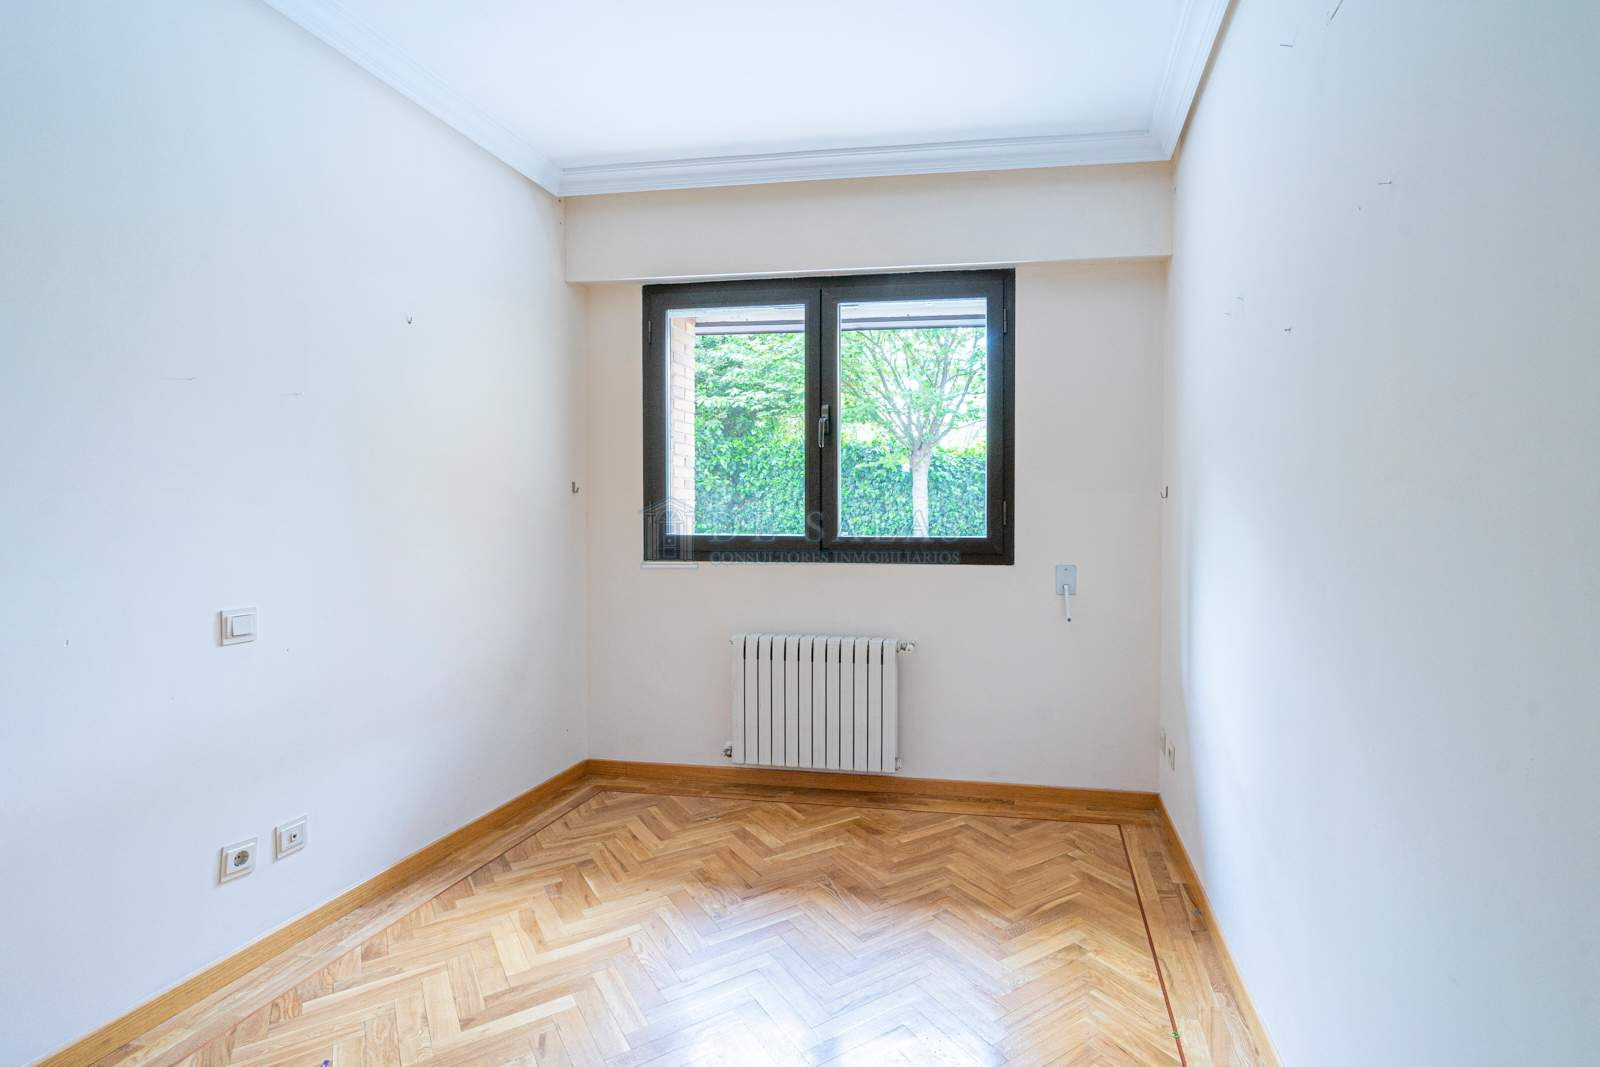 Dormitorio-0012